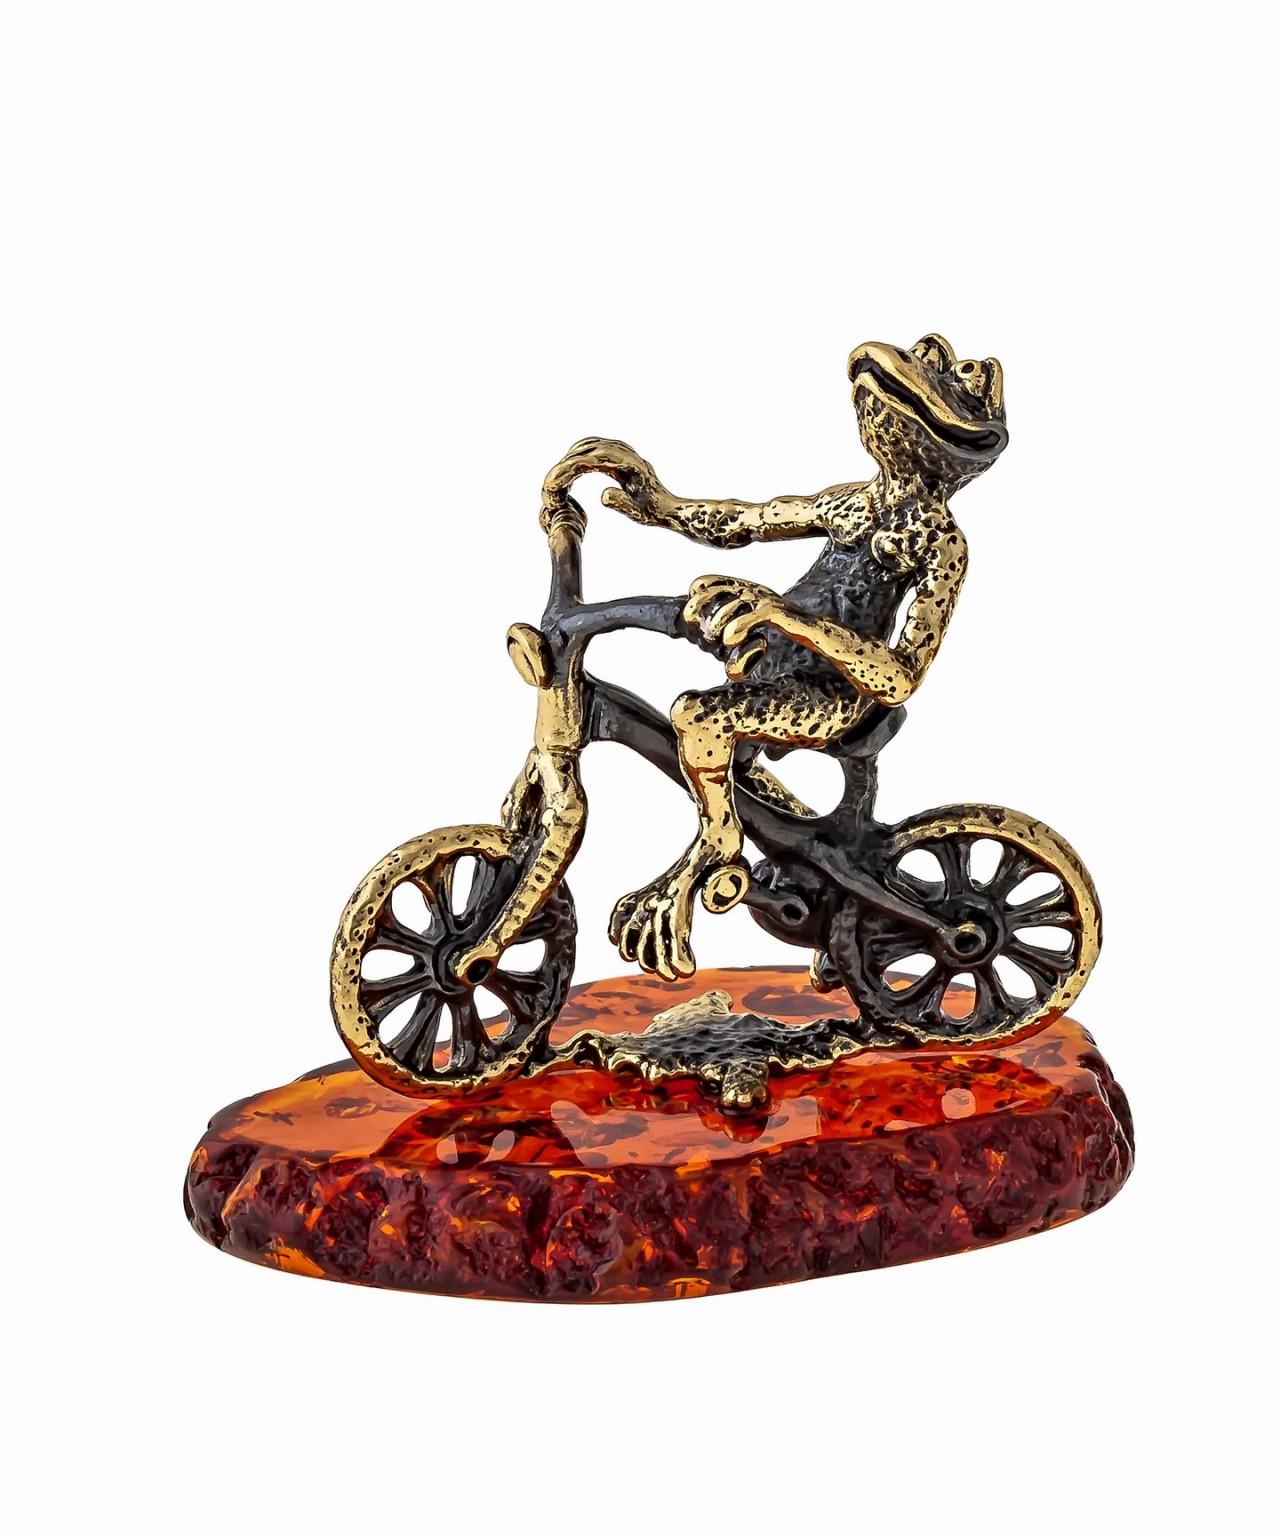 Лягушка на Велосипеде 1348